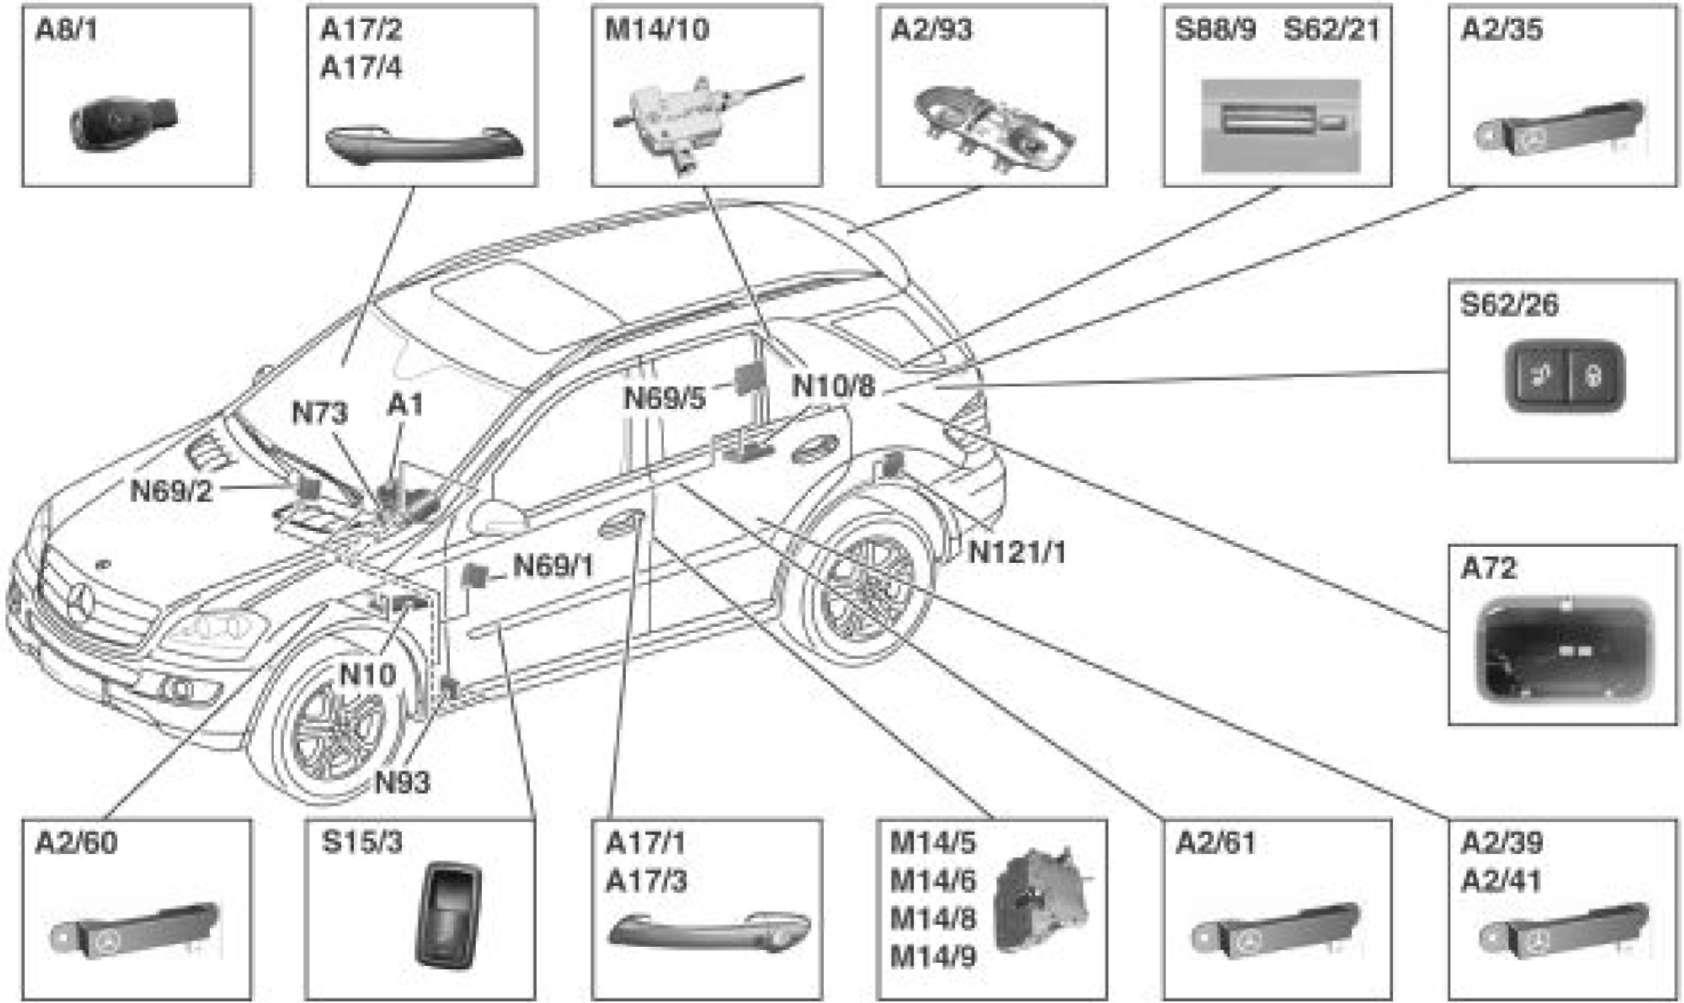 W164 Relay Diagram